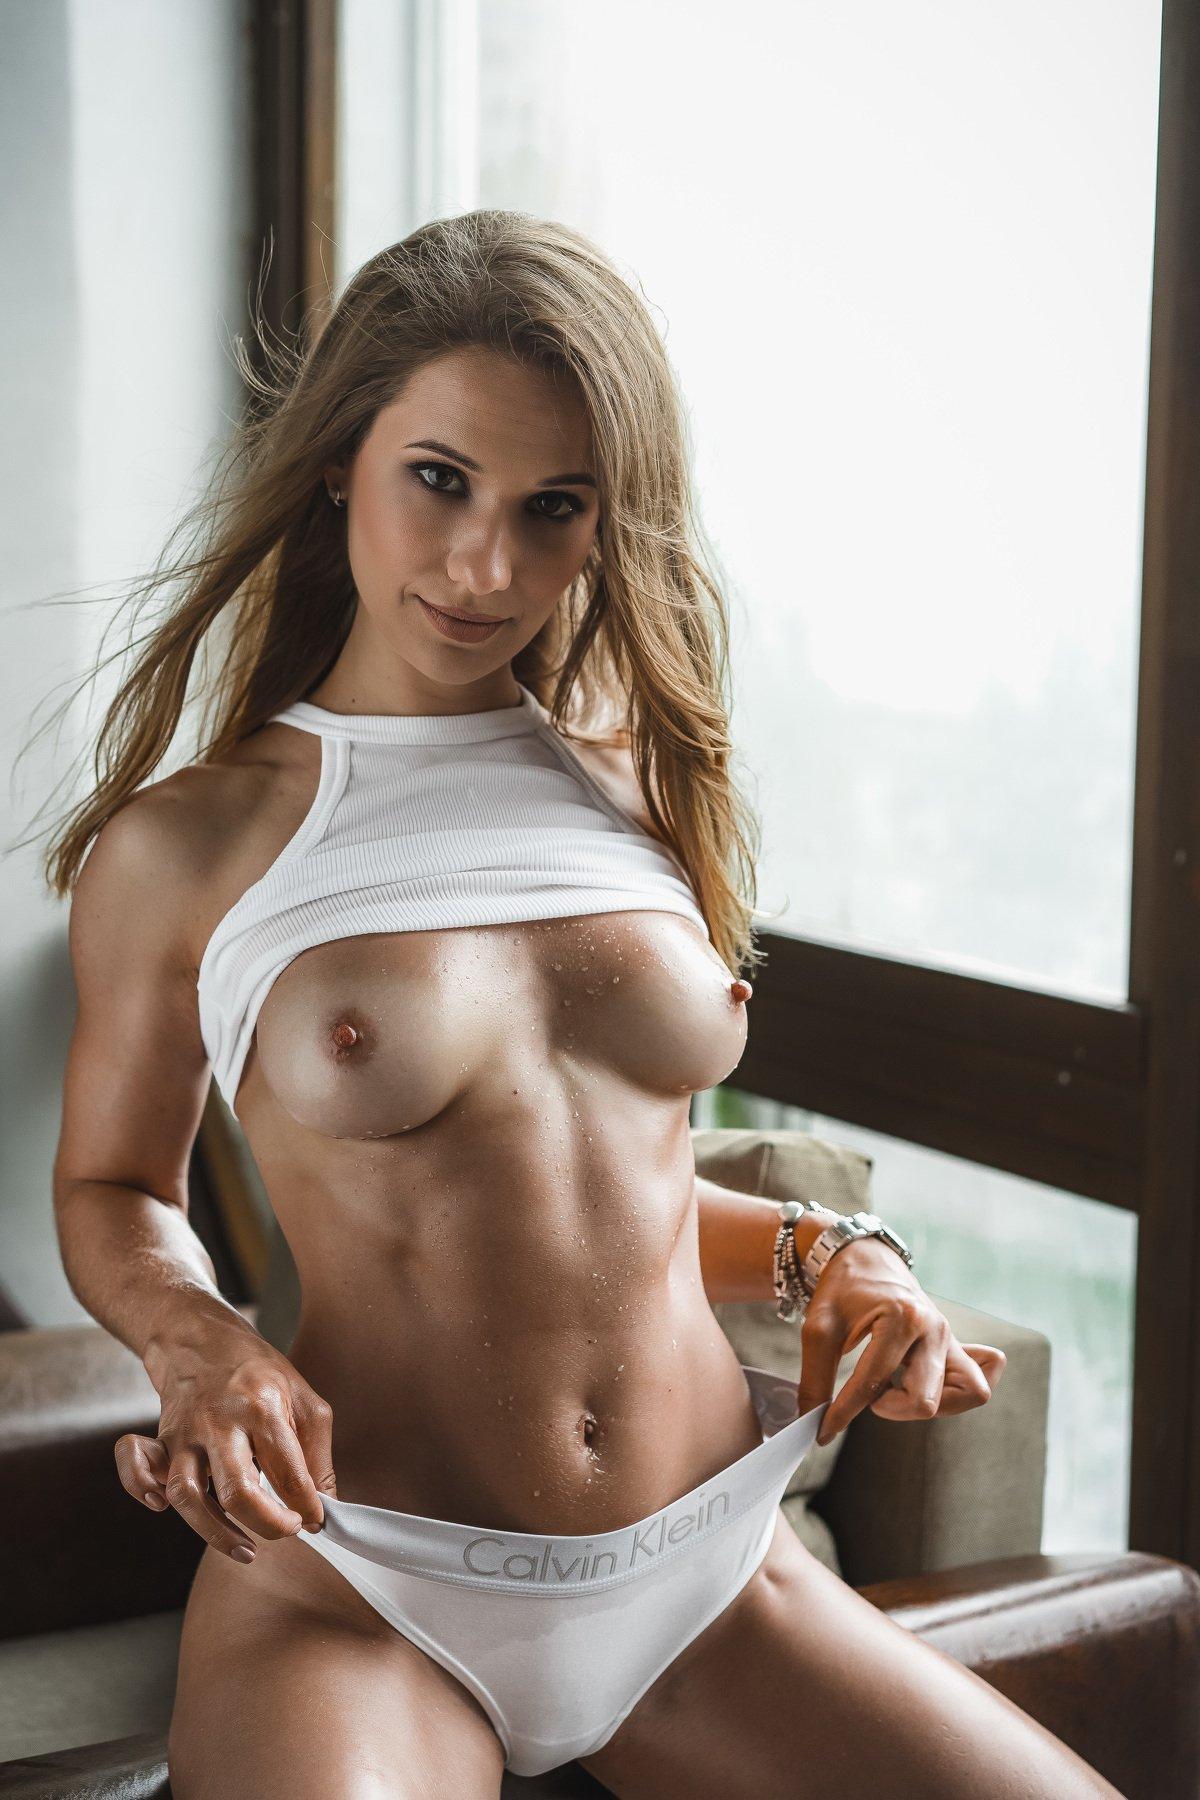 girl topless wood pretty topless, Пистолетов Илья